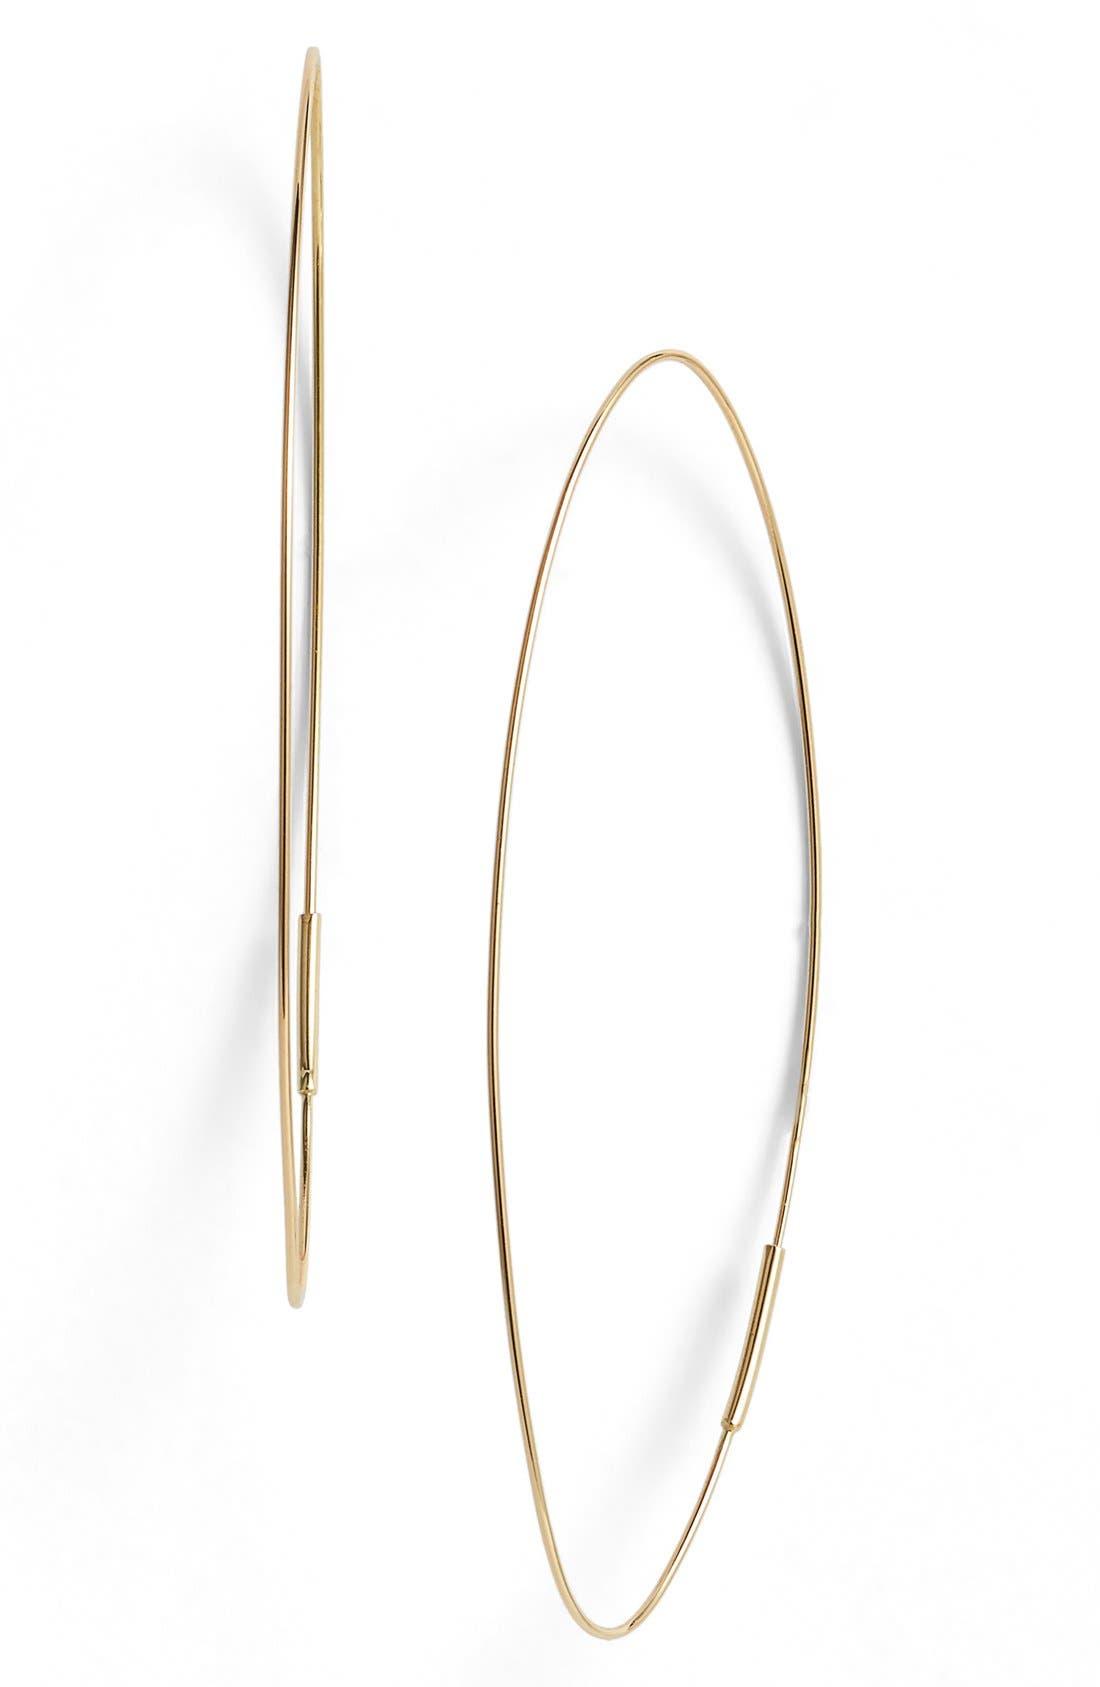 Lana Jewelry 'Magic' Large Oval Hoop Earrings